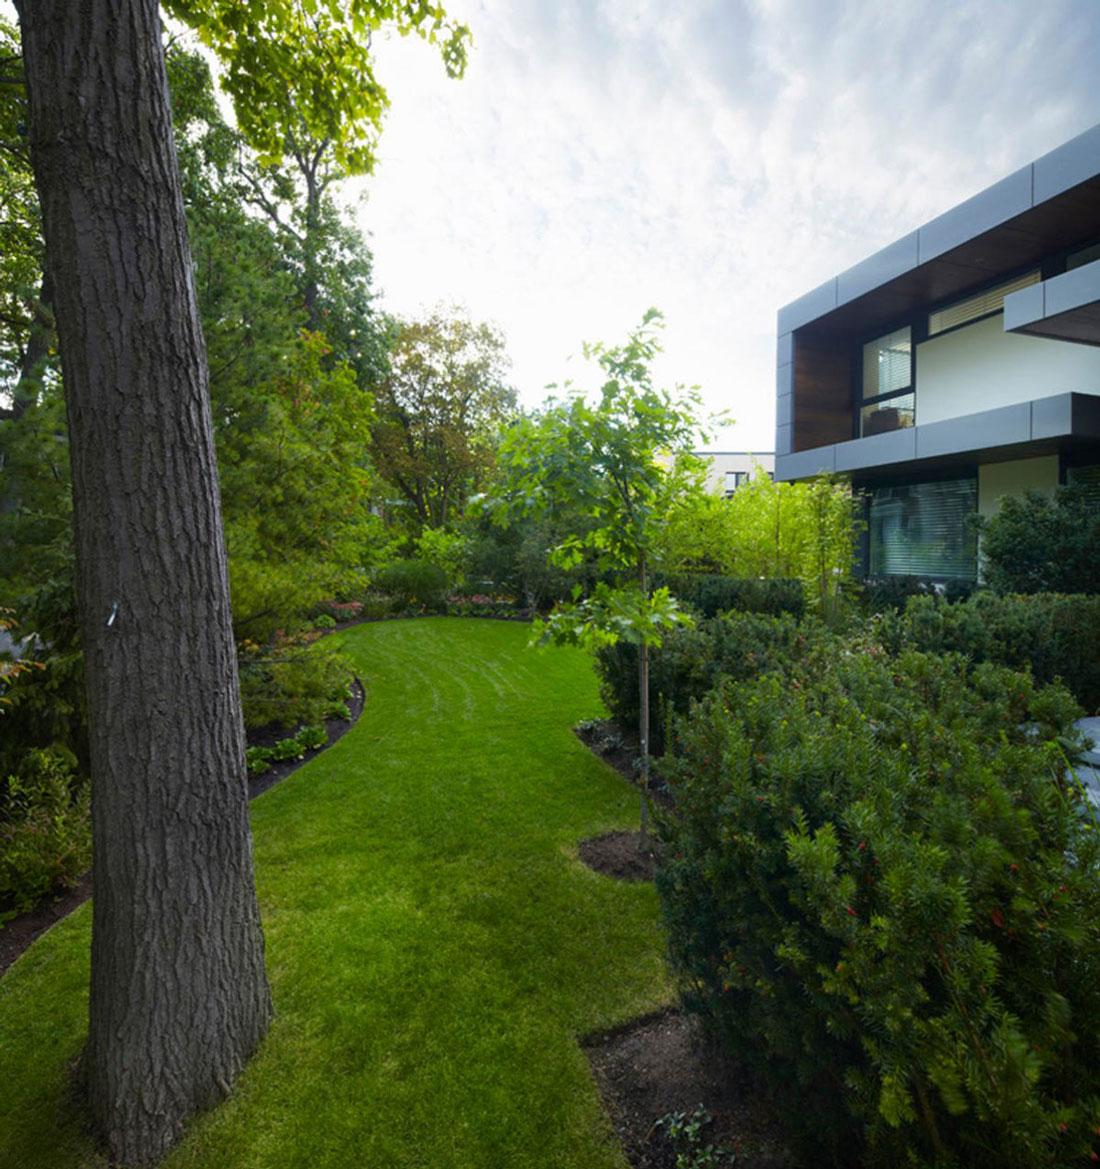 Lawn, Garden, Impressive Modern Home in Toronto, Canada